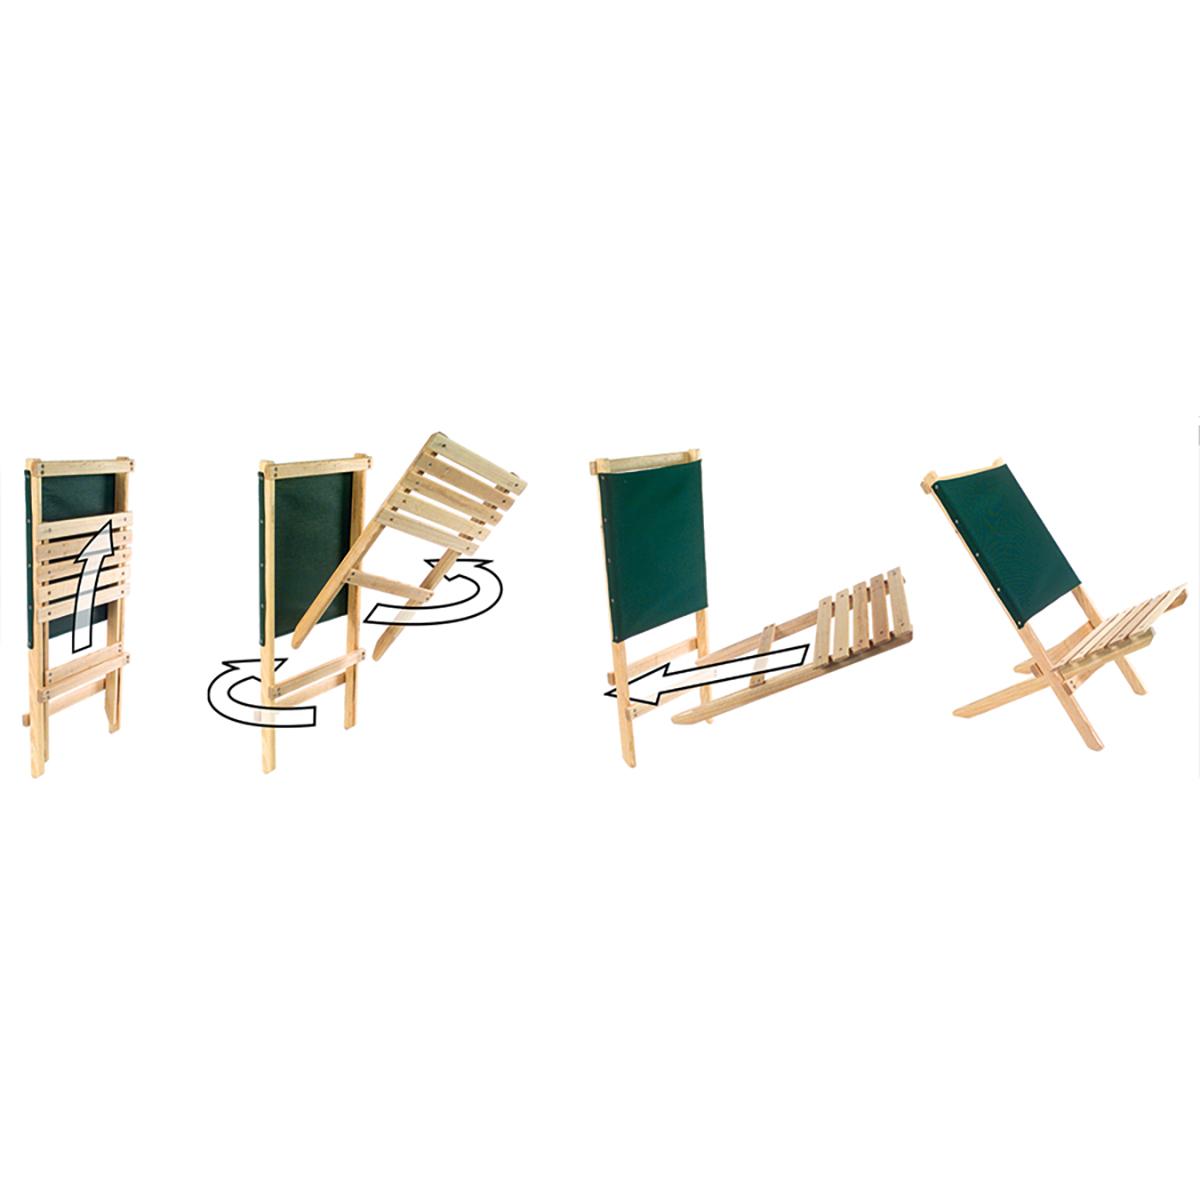 AIRMKT eCom PN XXXXXX Blue Ridge Chair Blue Ridge Chair Folding Instructions WEB